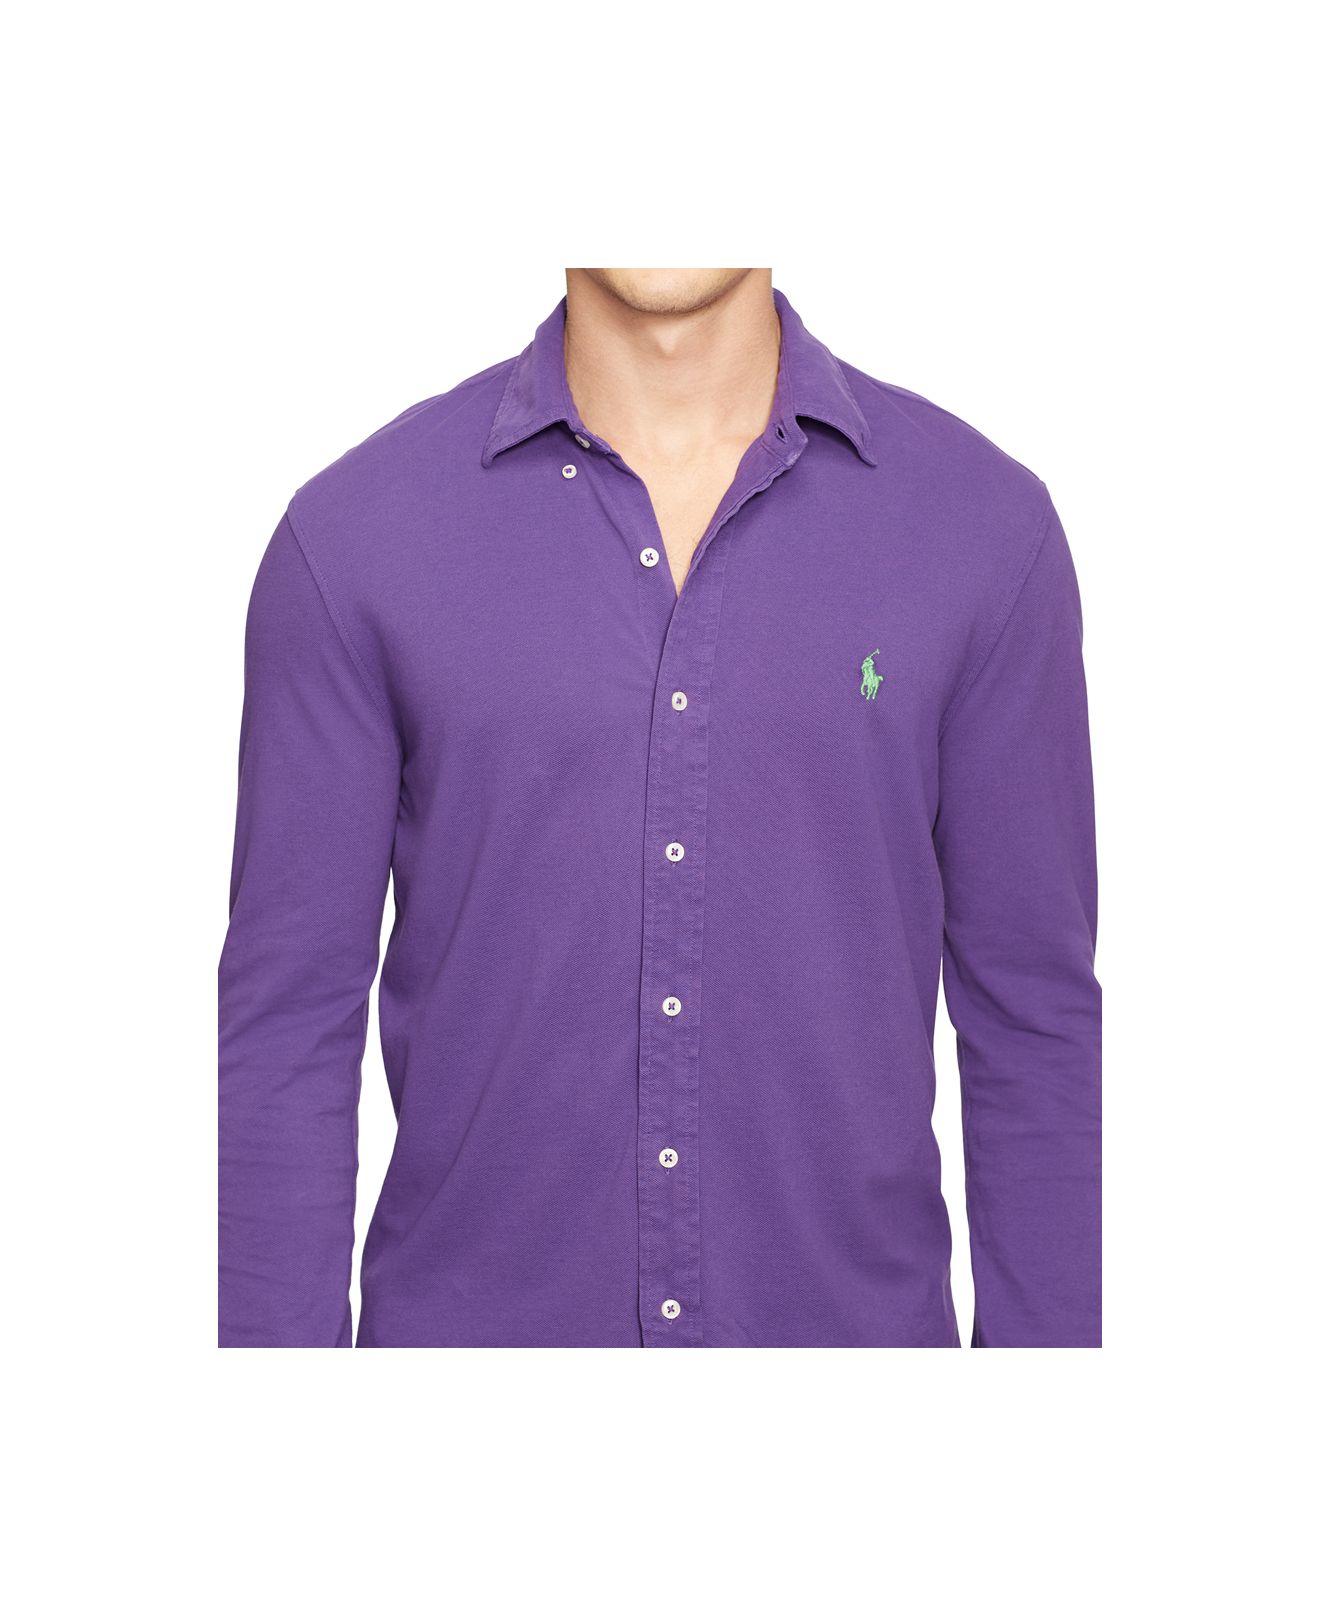 Polo ralph lauren Featherweight Mesh Button-down Shirt in Purple ...